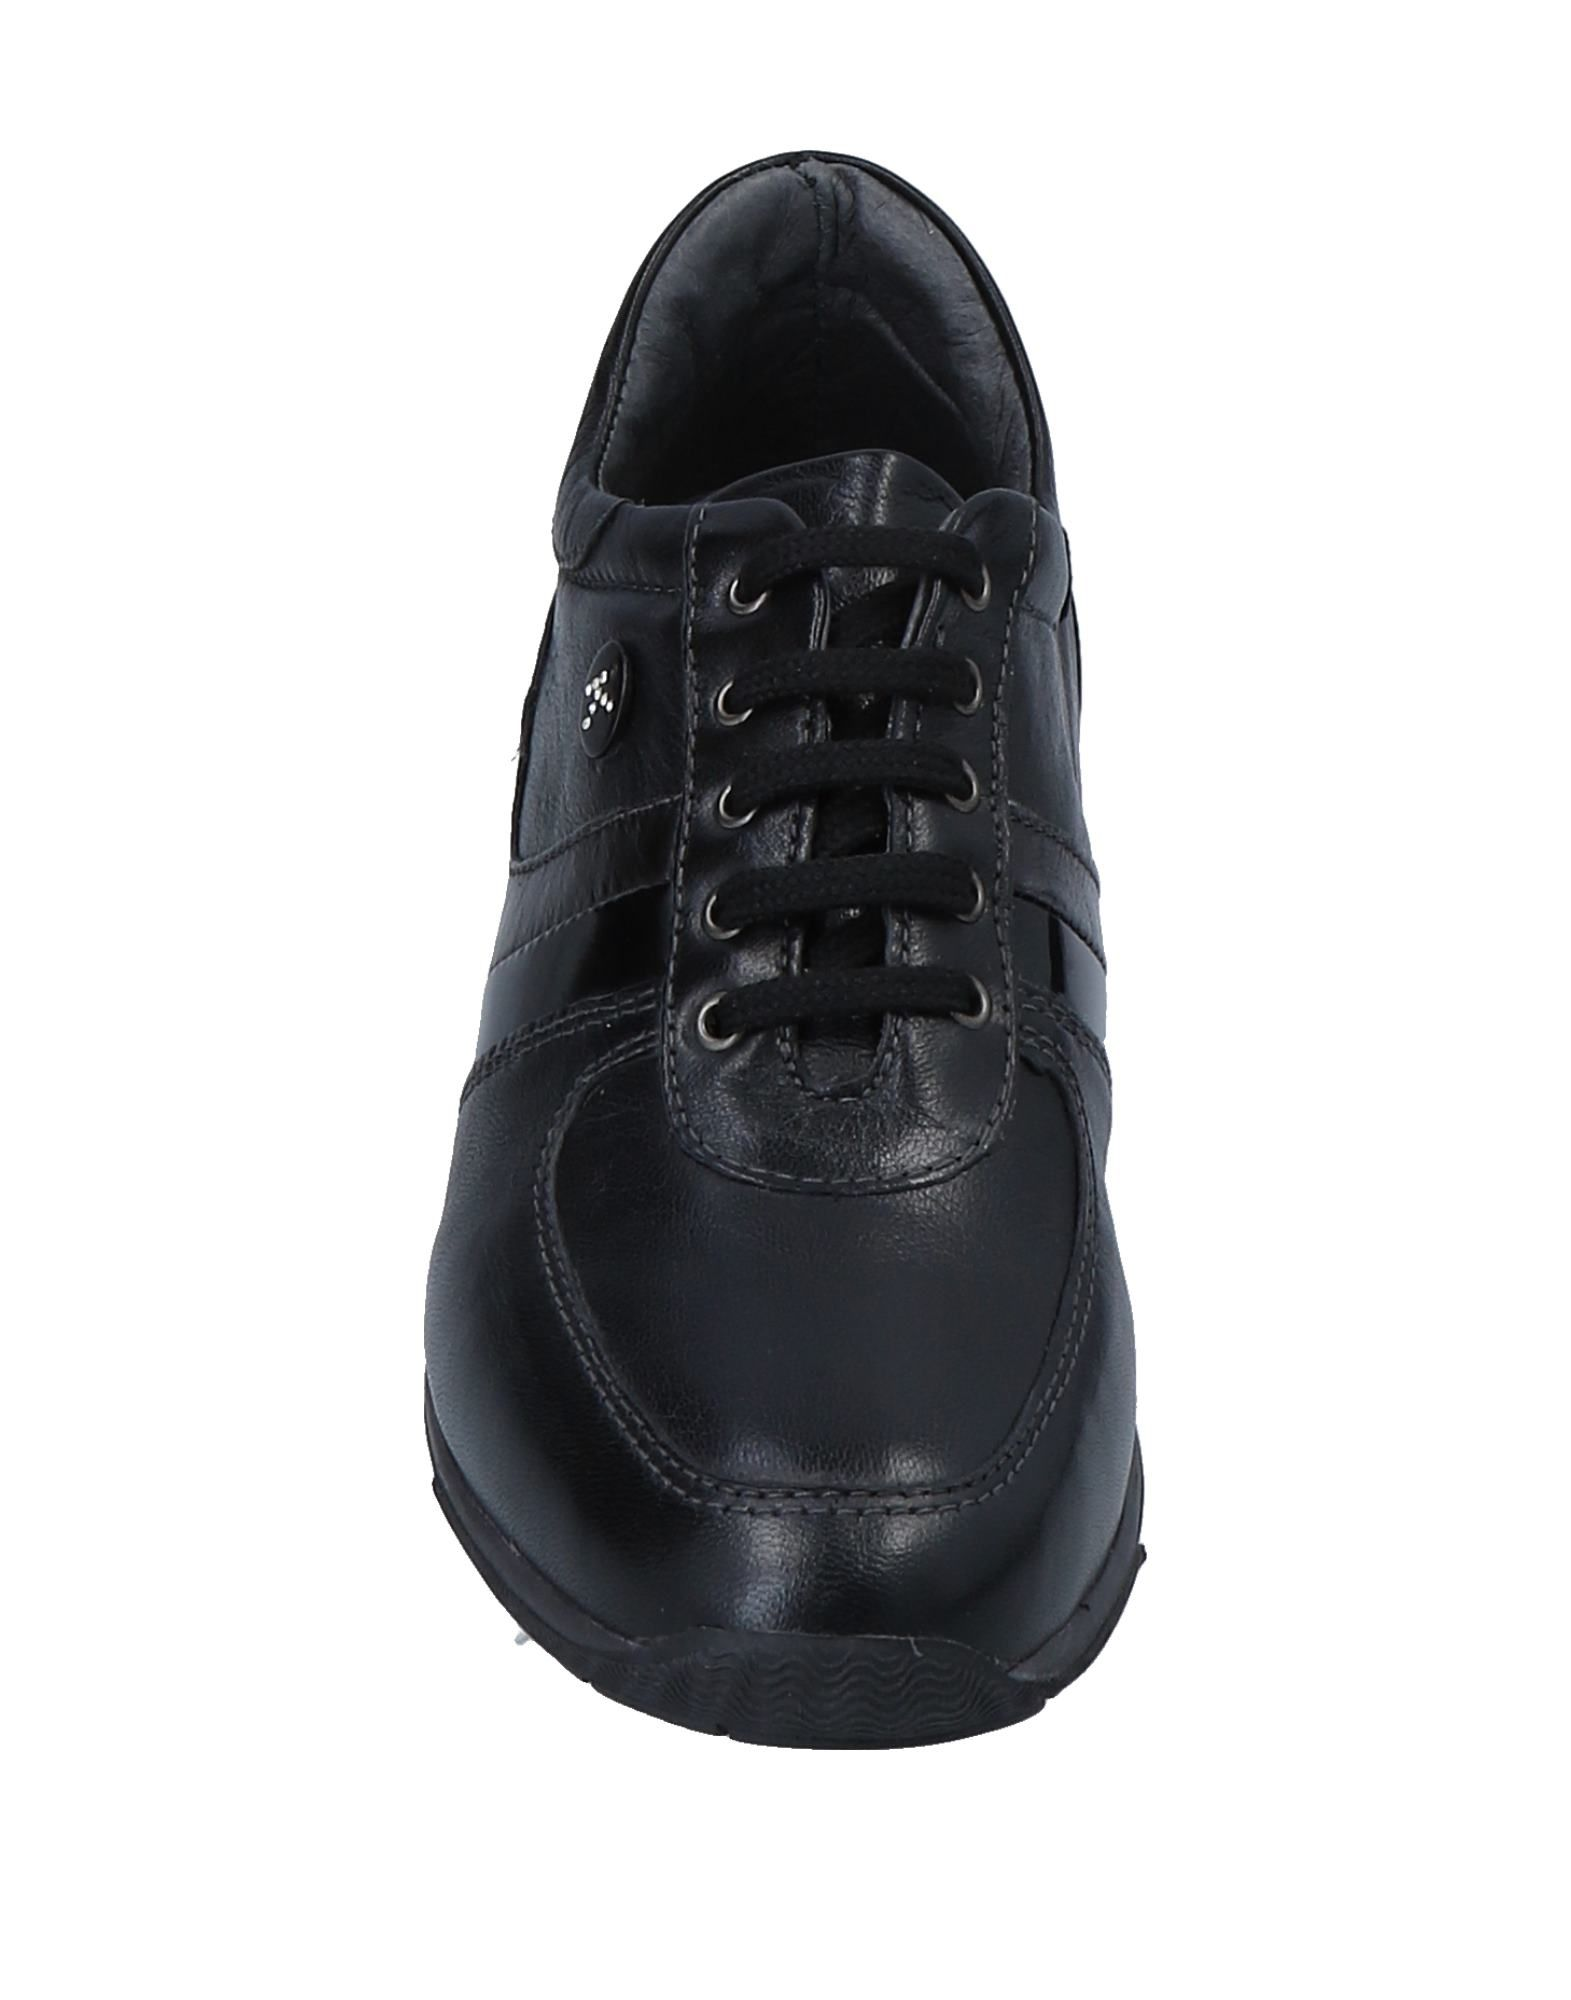 Keys Damen Sneakers Damen Keys  11552475KK Gute Qualität beliebte Schuhe fd55fc